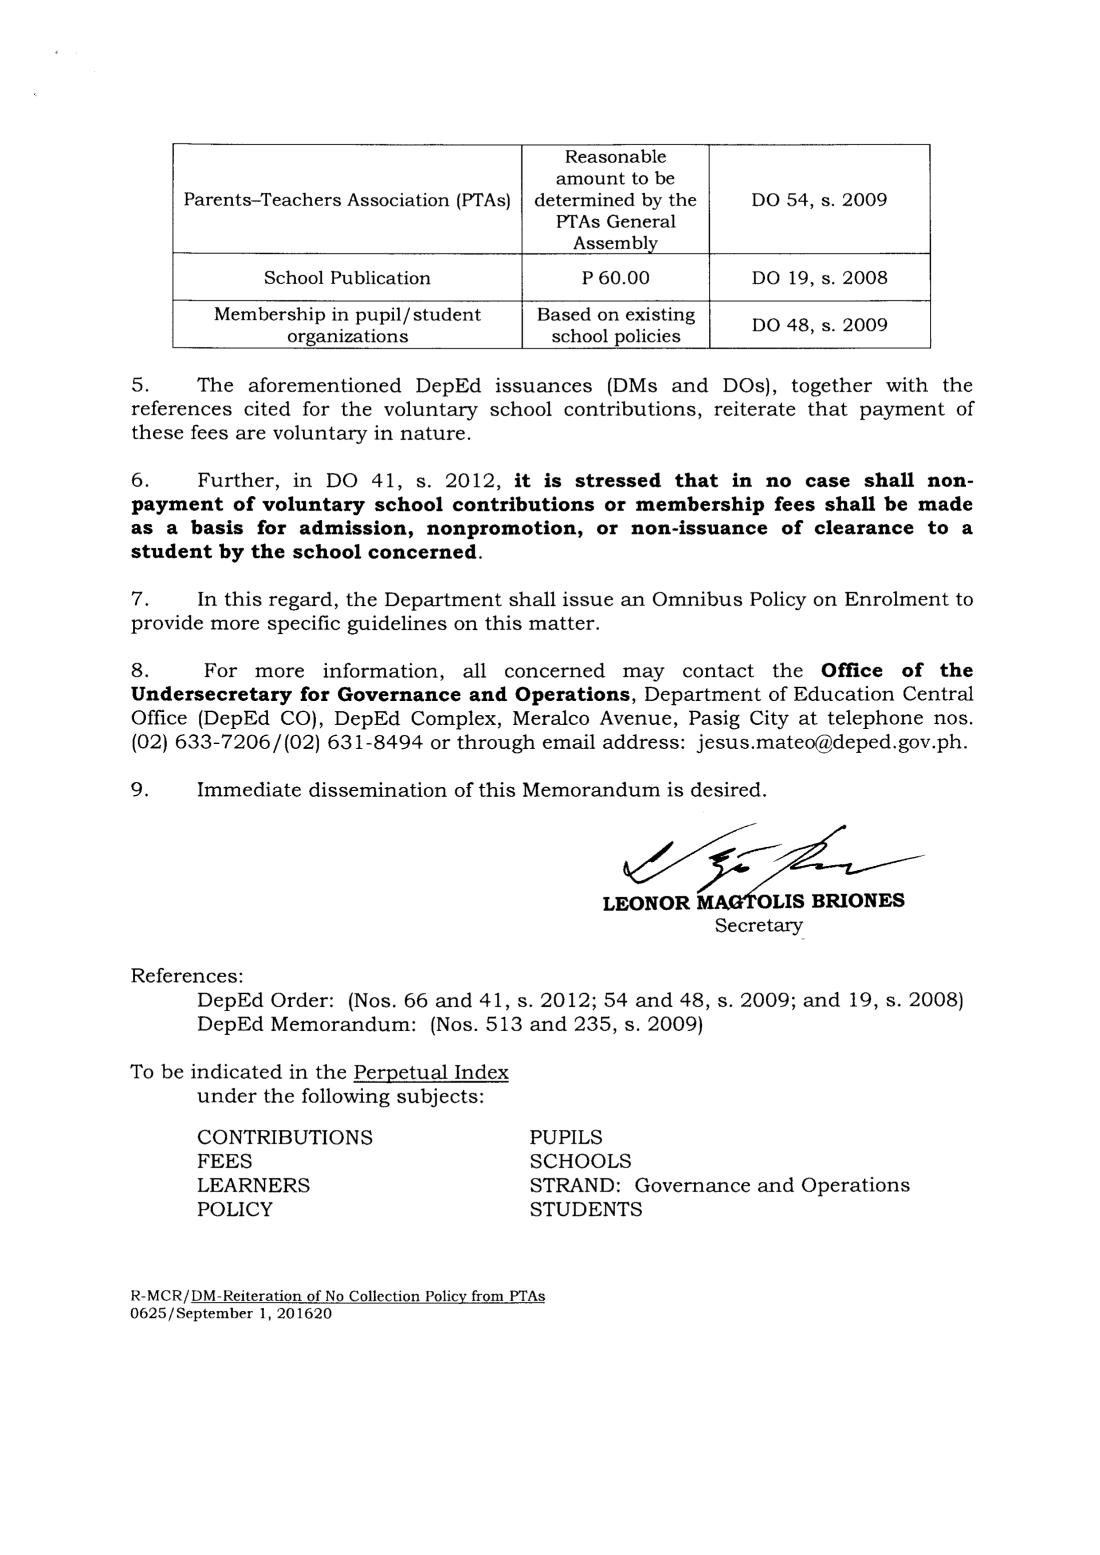 deped-memorandum-143-series-2016-page-2